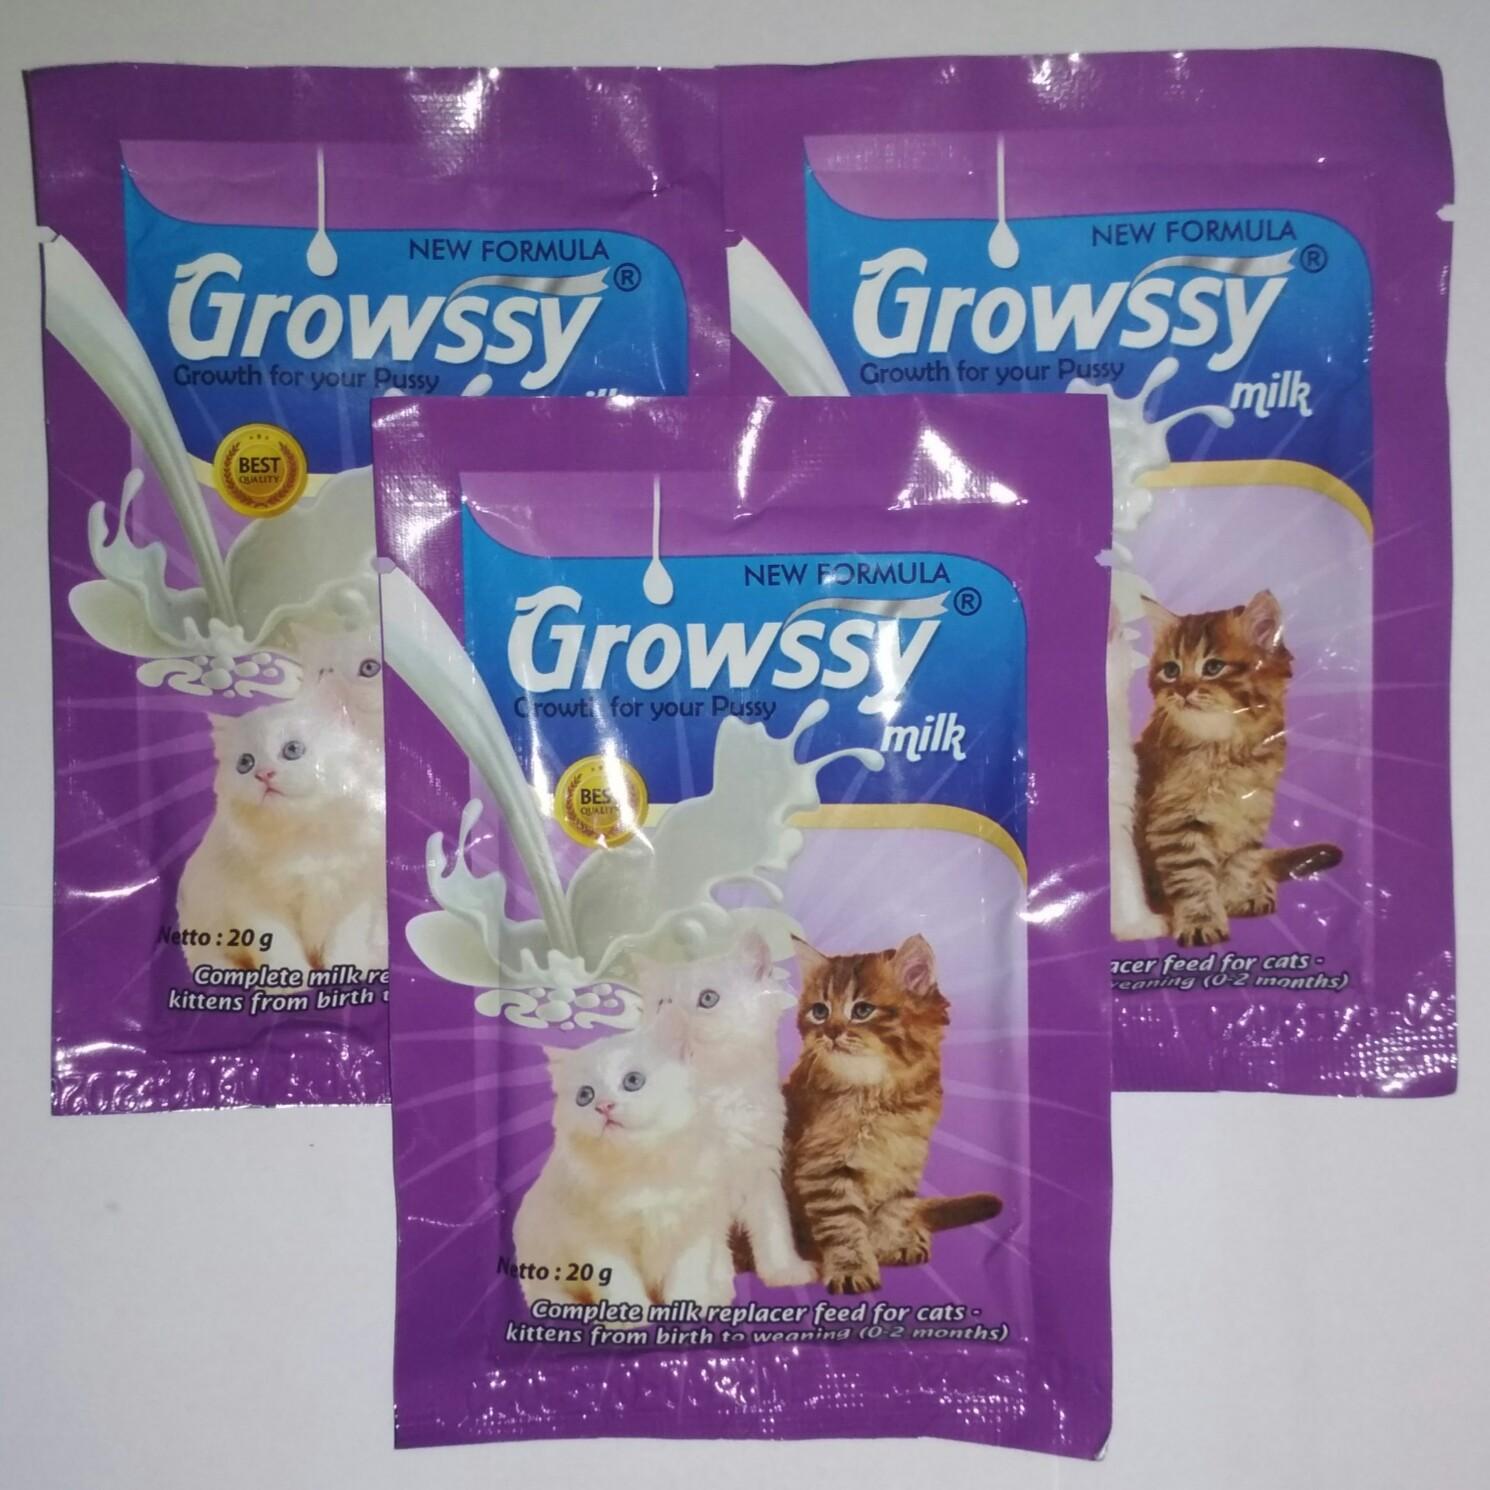 Makanan Kucing Terbaik Whiskas Dry 480gr Kering Rasa Tuna Pengganti Susu